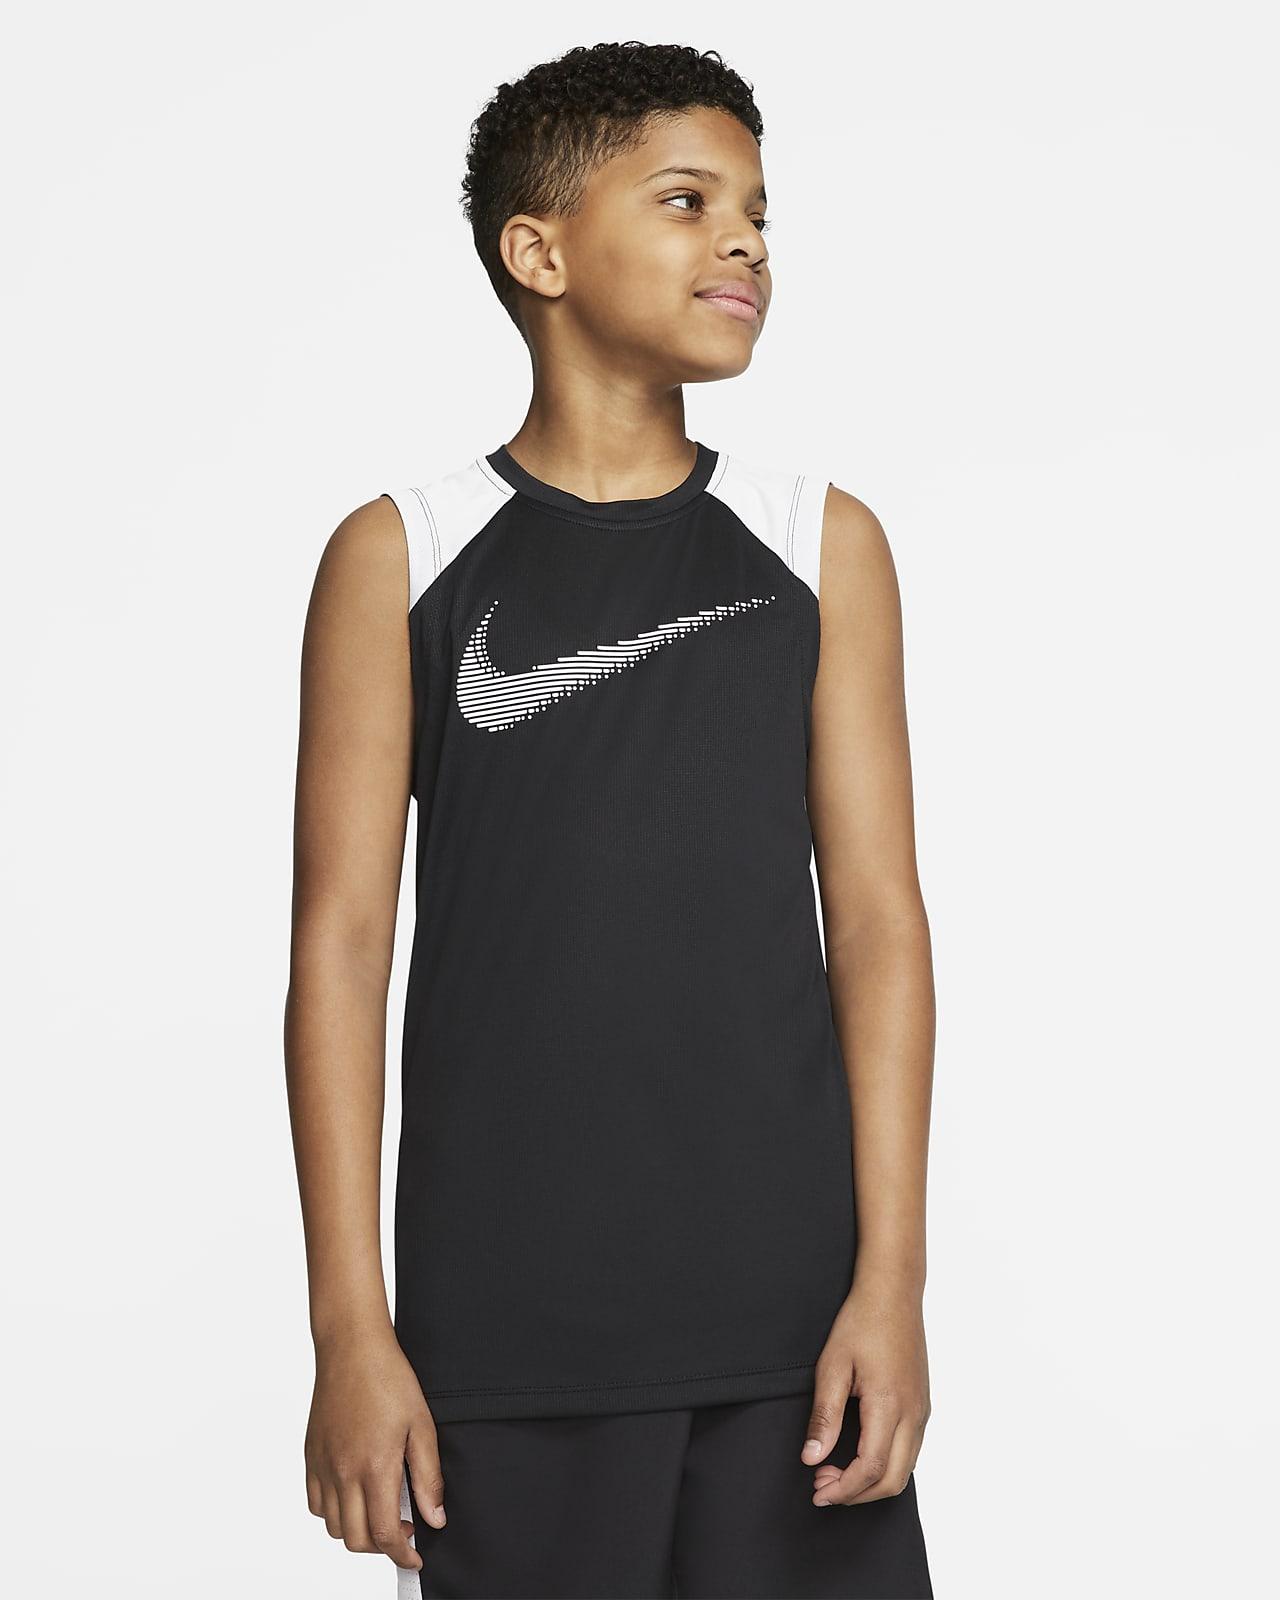 Nike Older Kids' (Boys') Sleeveless Graphic Training Top